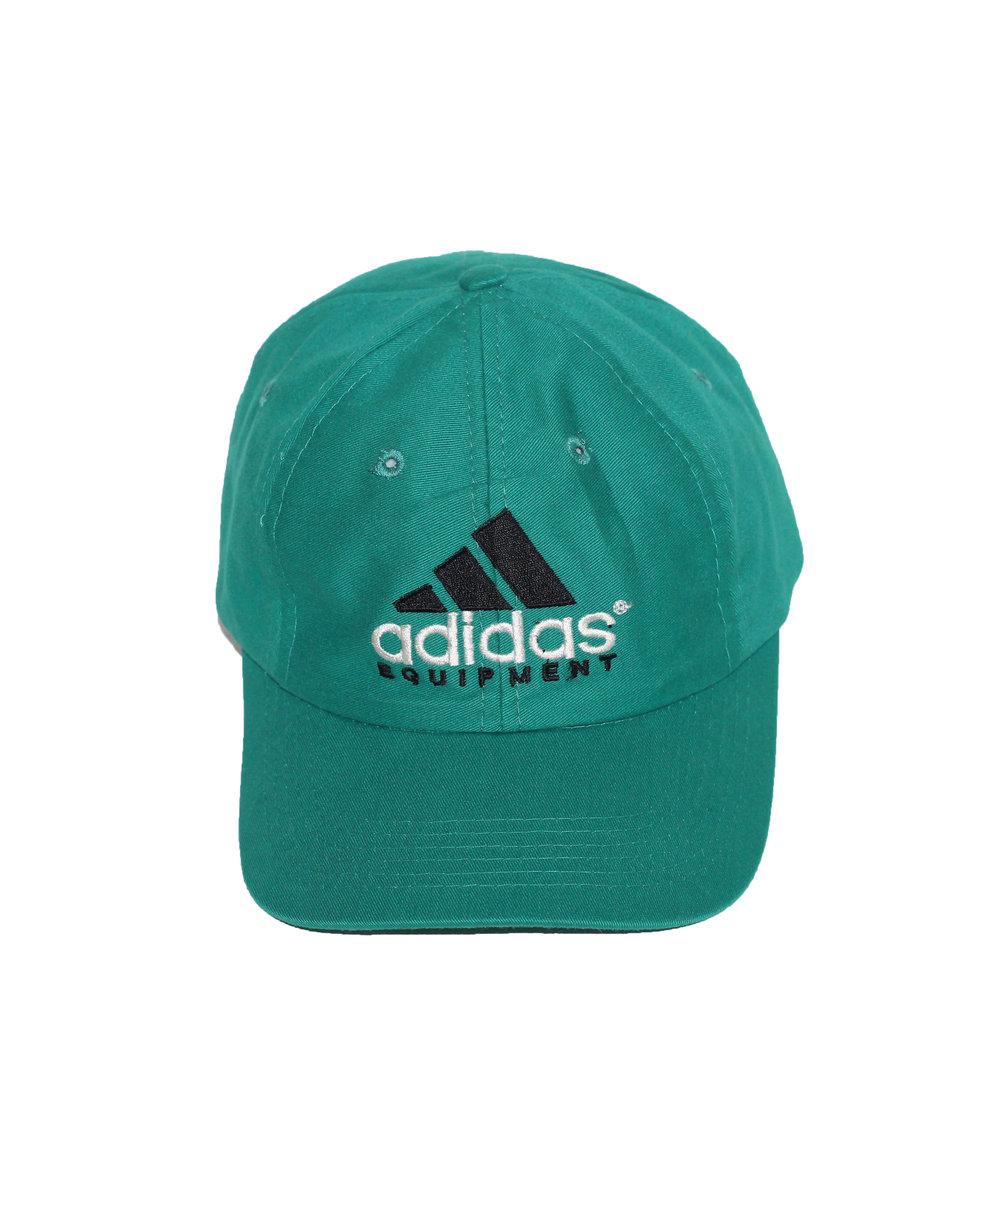 Vintage 90s Adidas Equipment strap back hat 21fb611bdac7